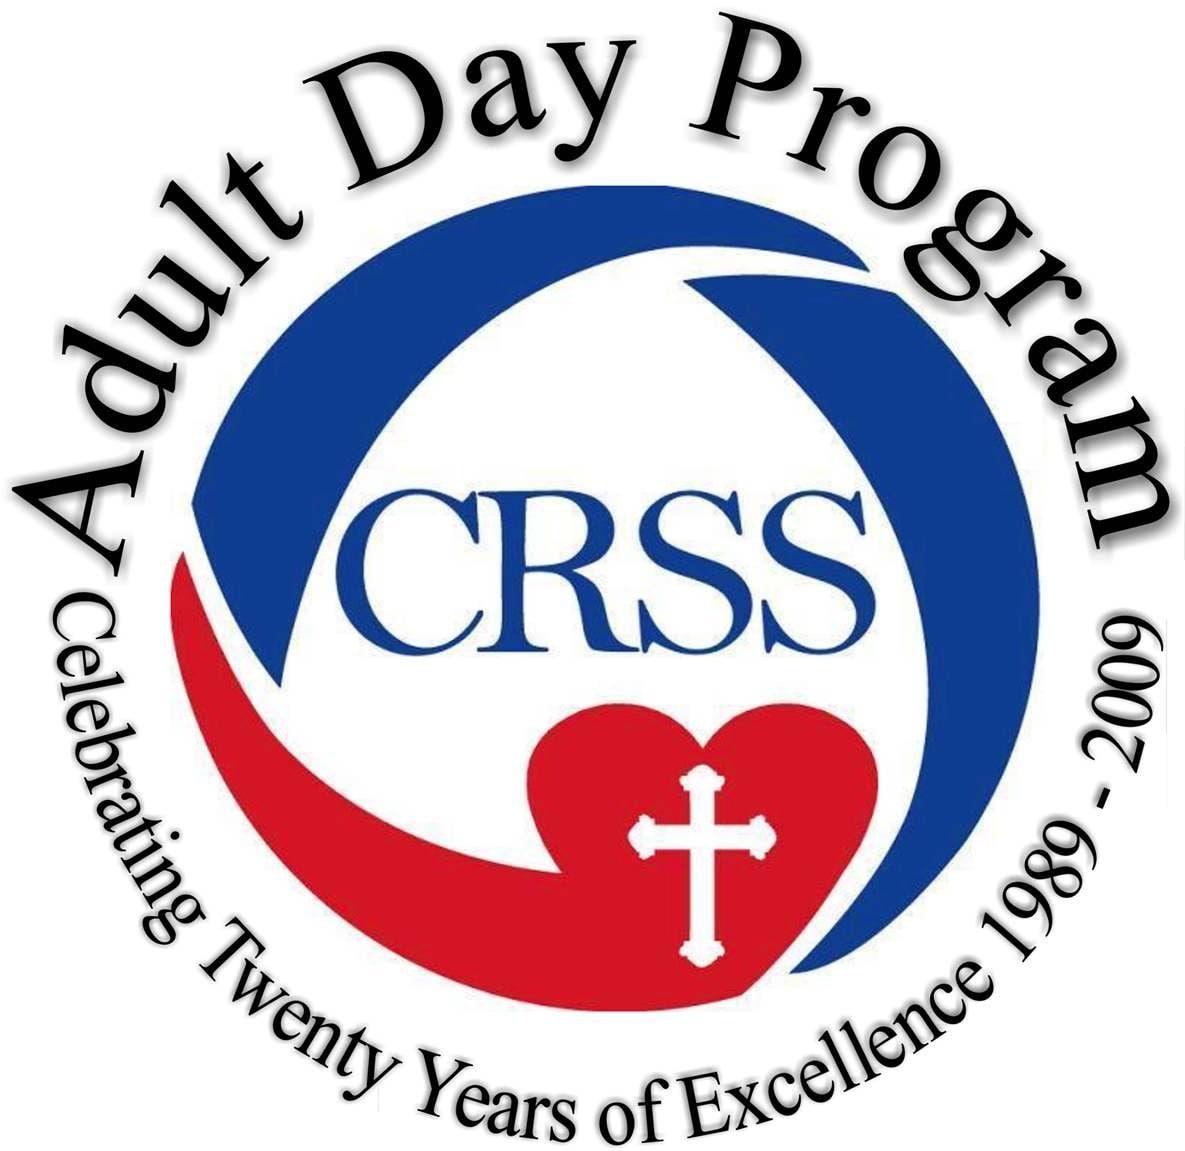 Cardinal Ritter Senior Services Adult Day Program